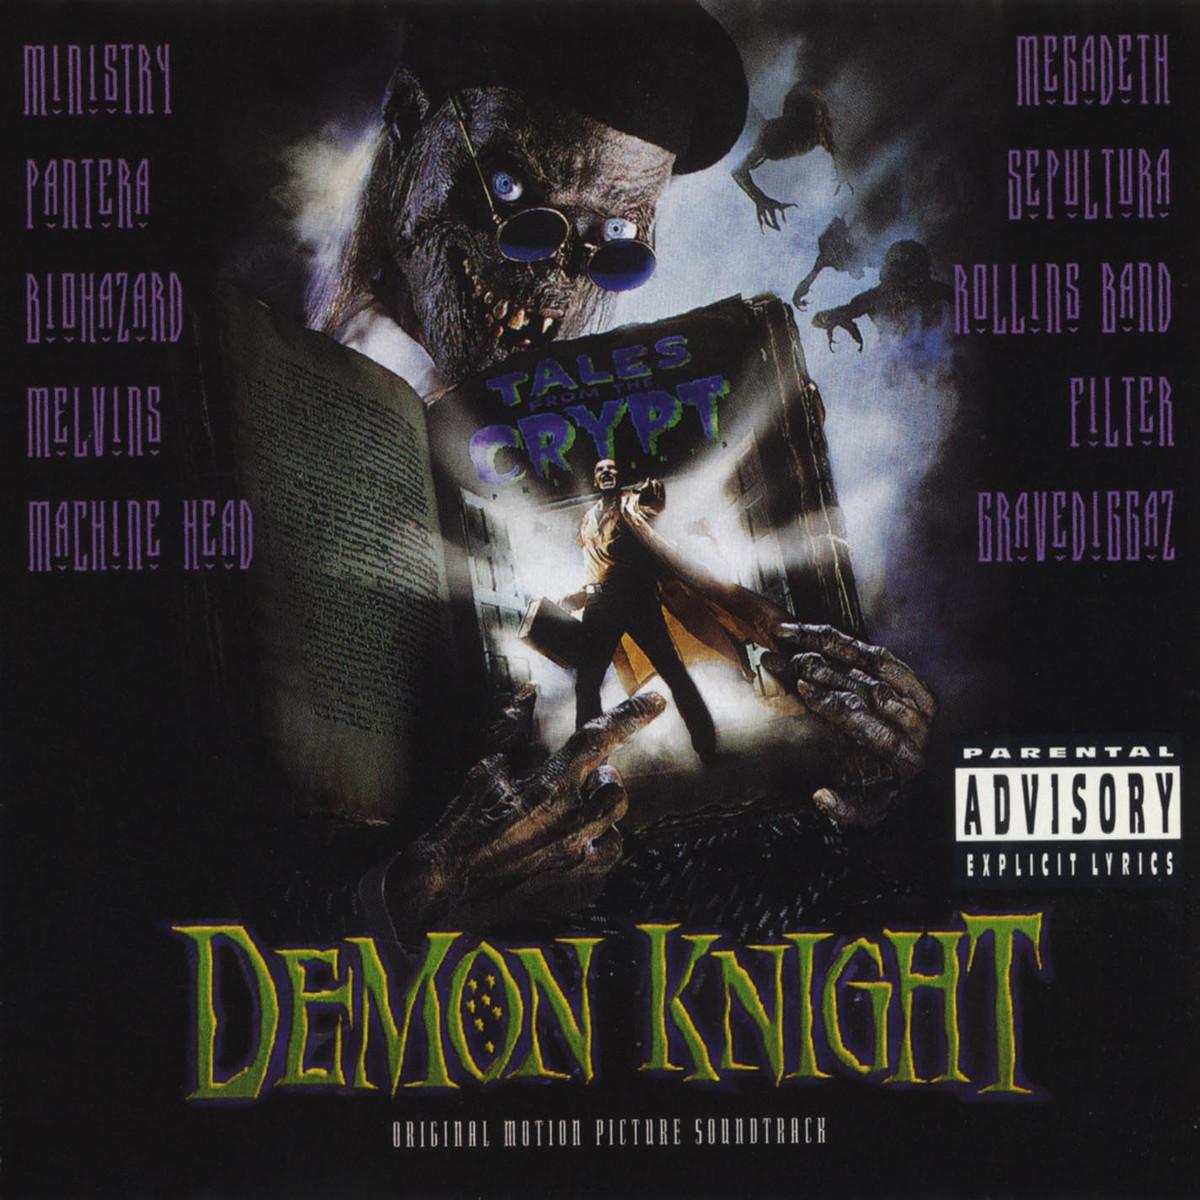 demon knight original motion picture soundtrack tales